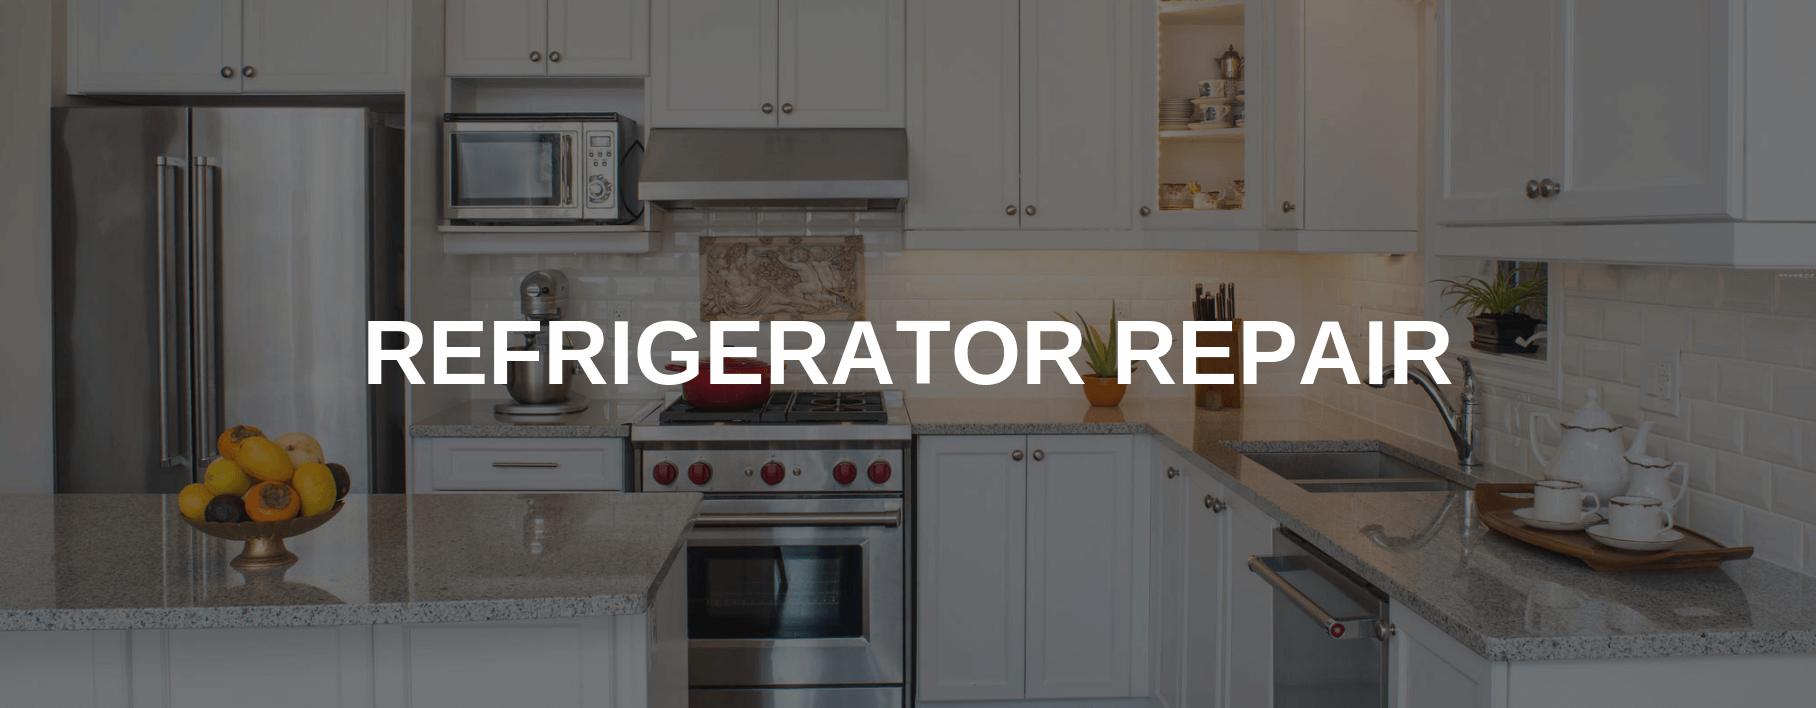 orlando refrigerator repair